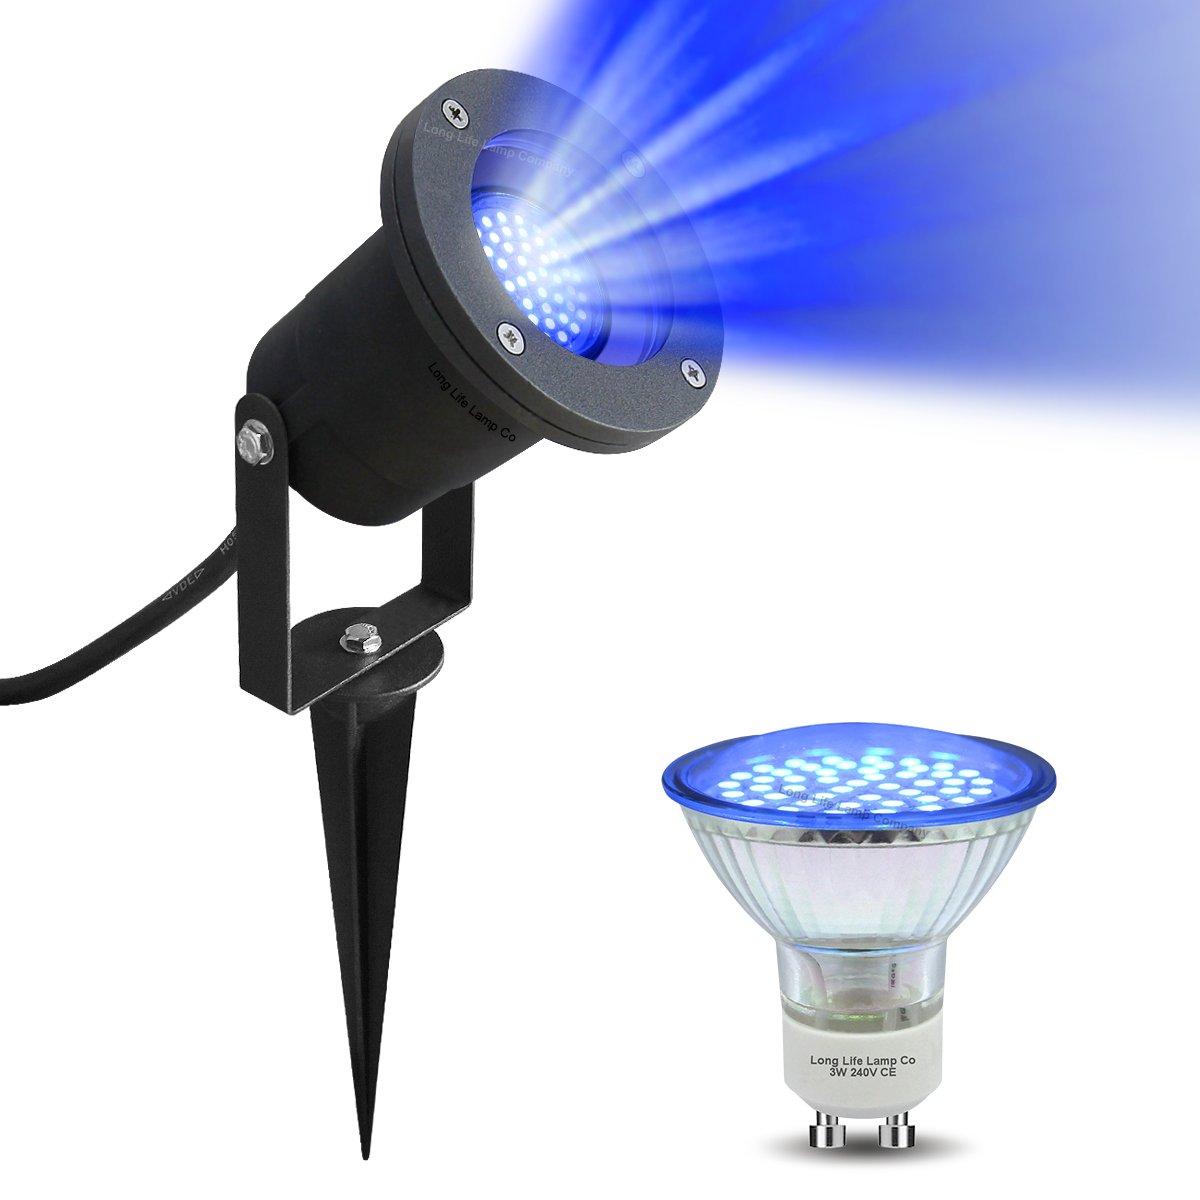 Blue LED Garden Spike -Wall Light Blue LED GU10 Outdoor IP65 Black Spike Light 4w LED Long Life Lamp Company